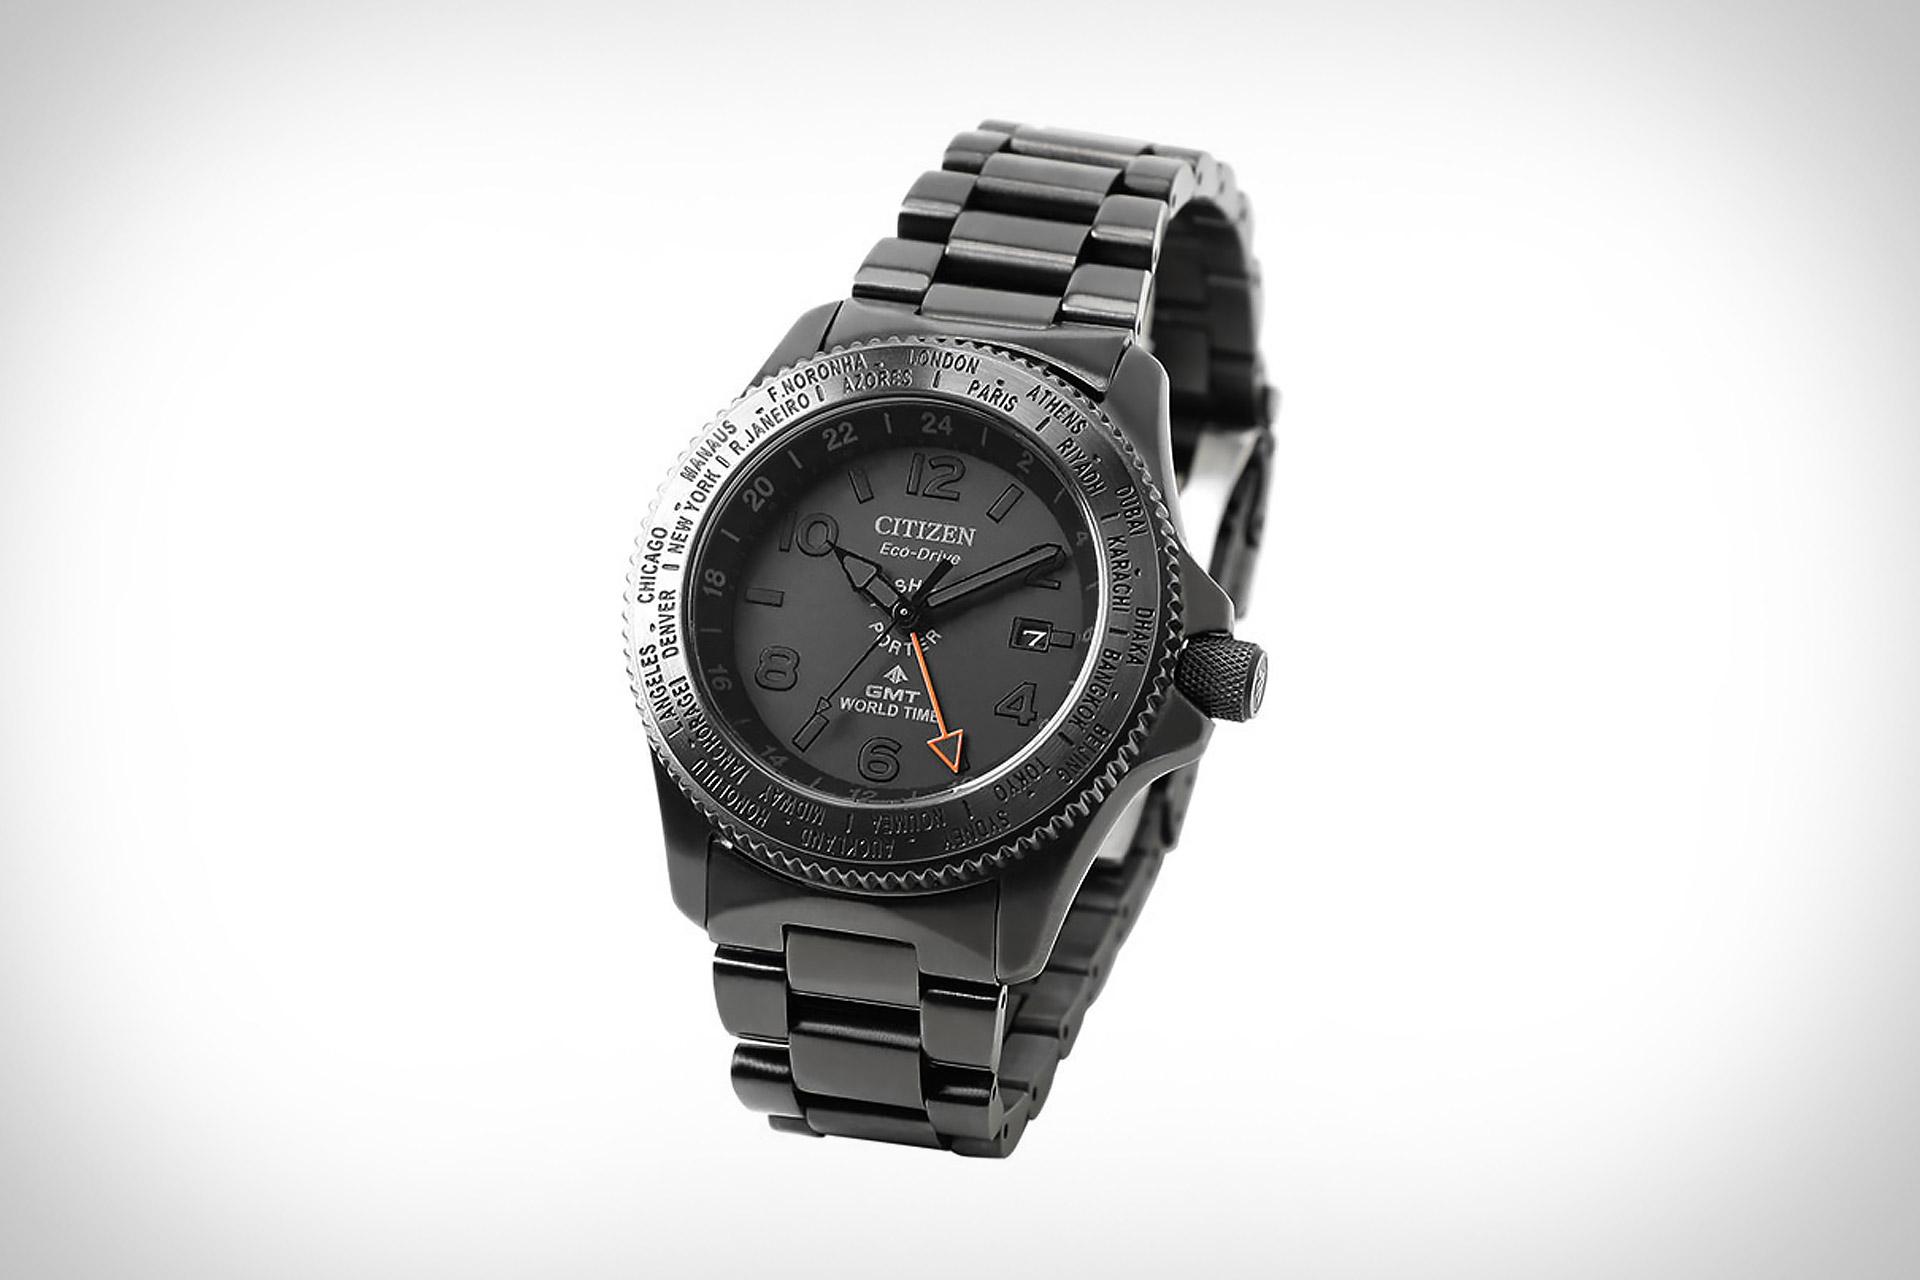 Citizen x Porter GMT World Time Watch